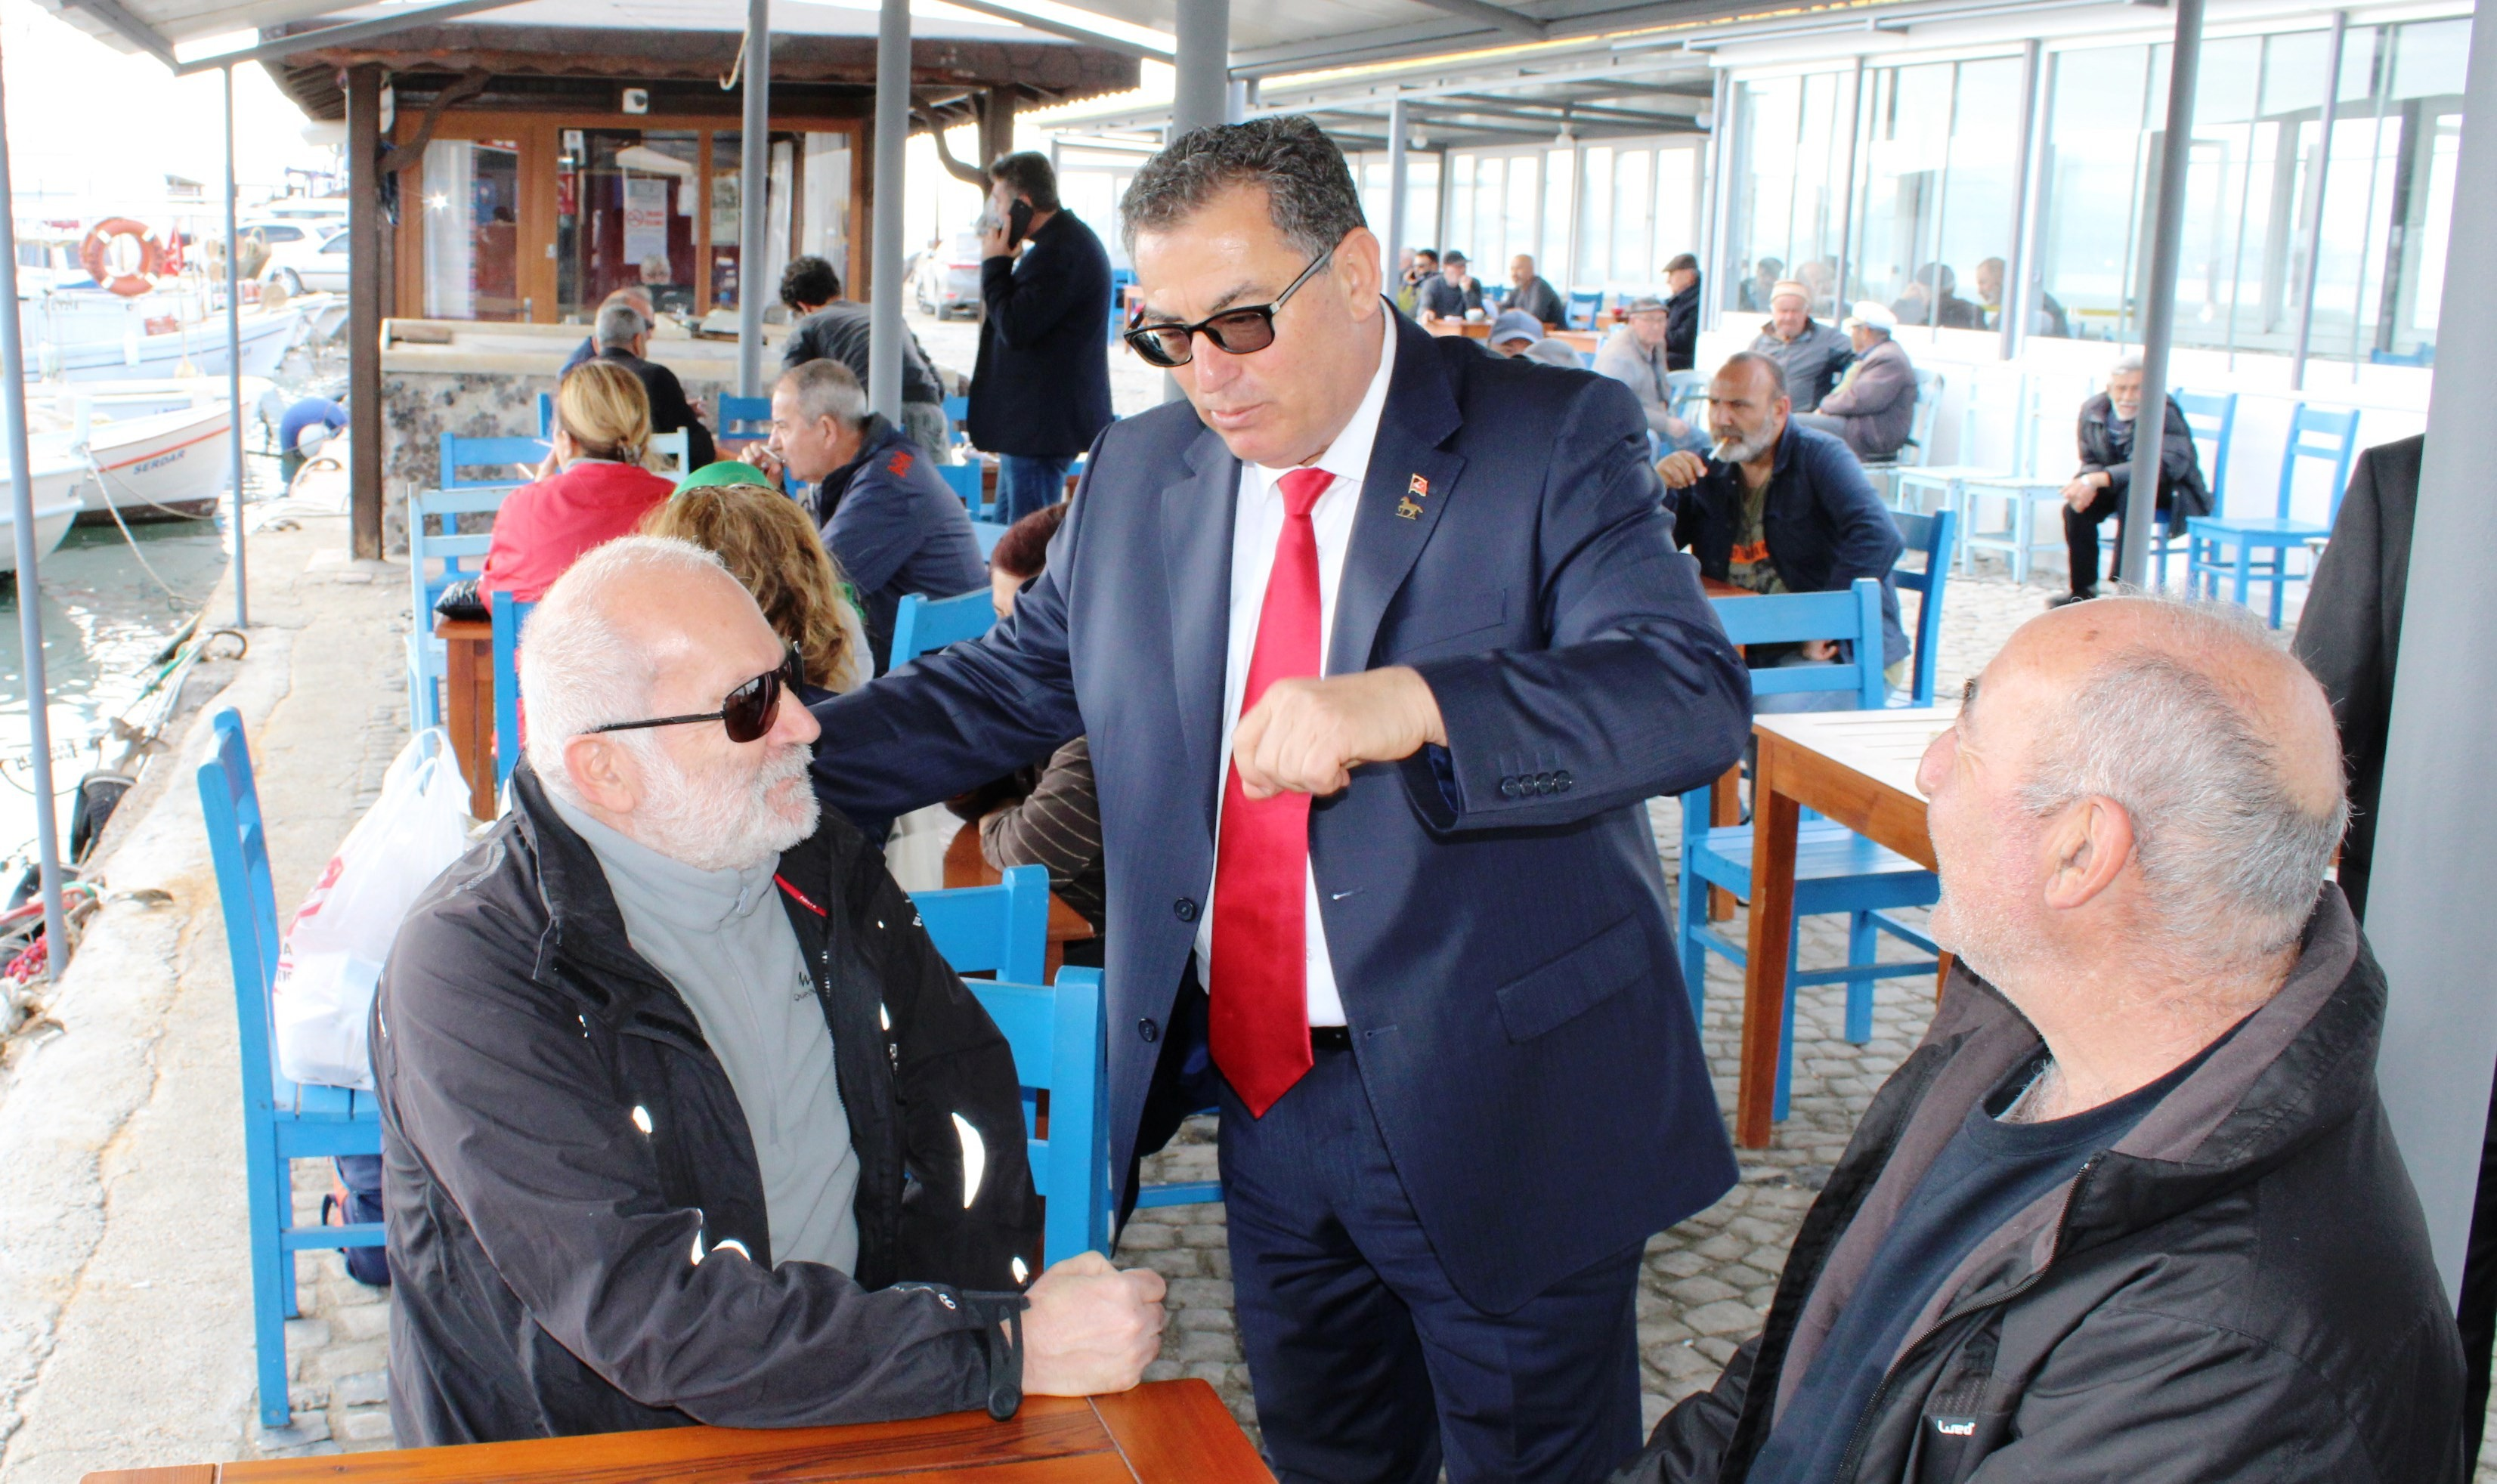 halil ibrahim kaynar KAYNAR, TURGUREİS'TEN SESLENDİ: ALT YAPI BENİM İŞİM… kaynar turgutreis3